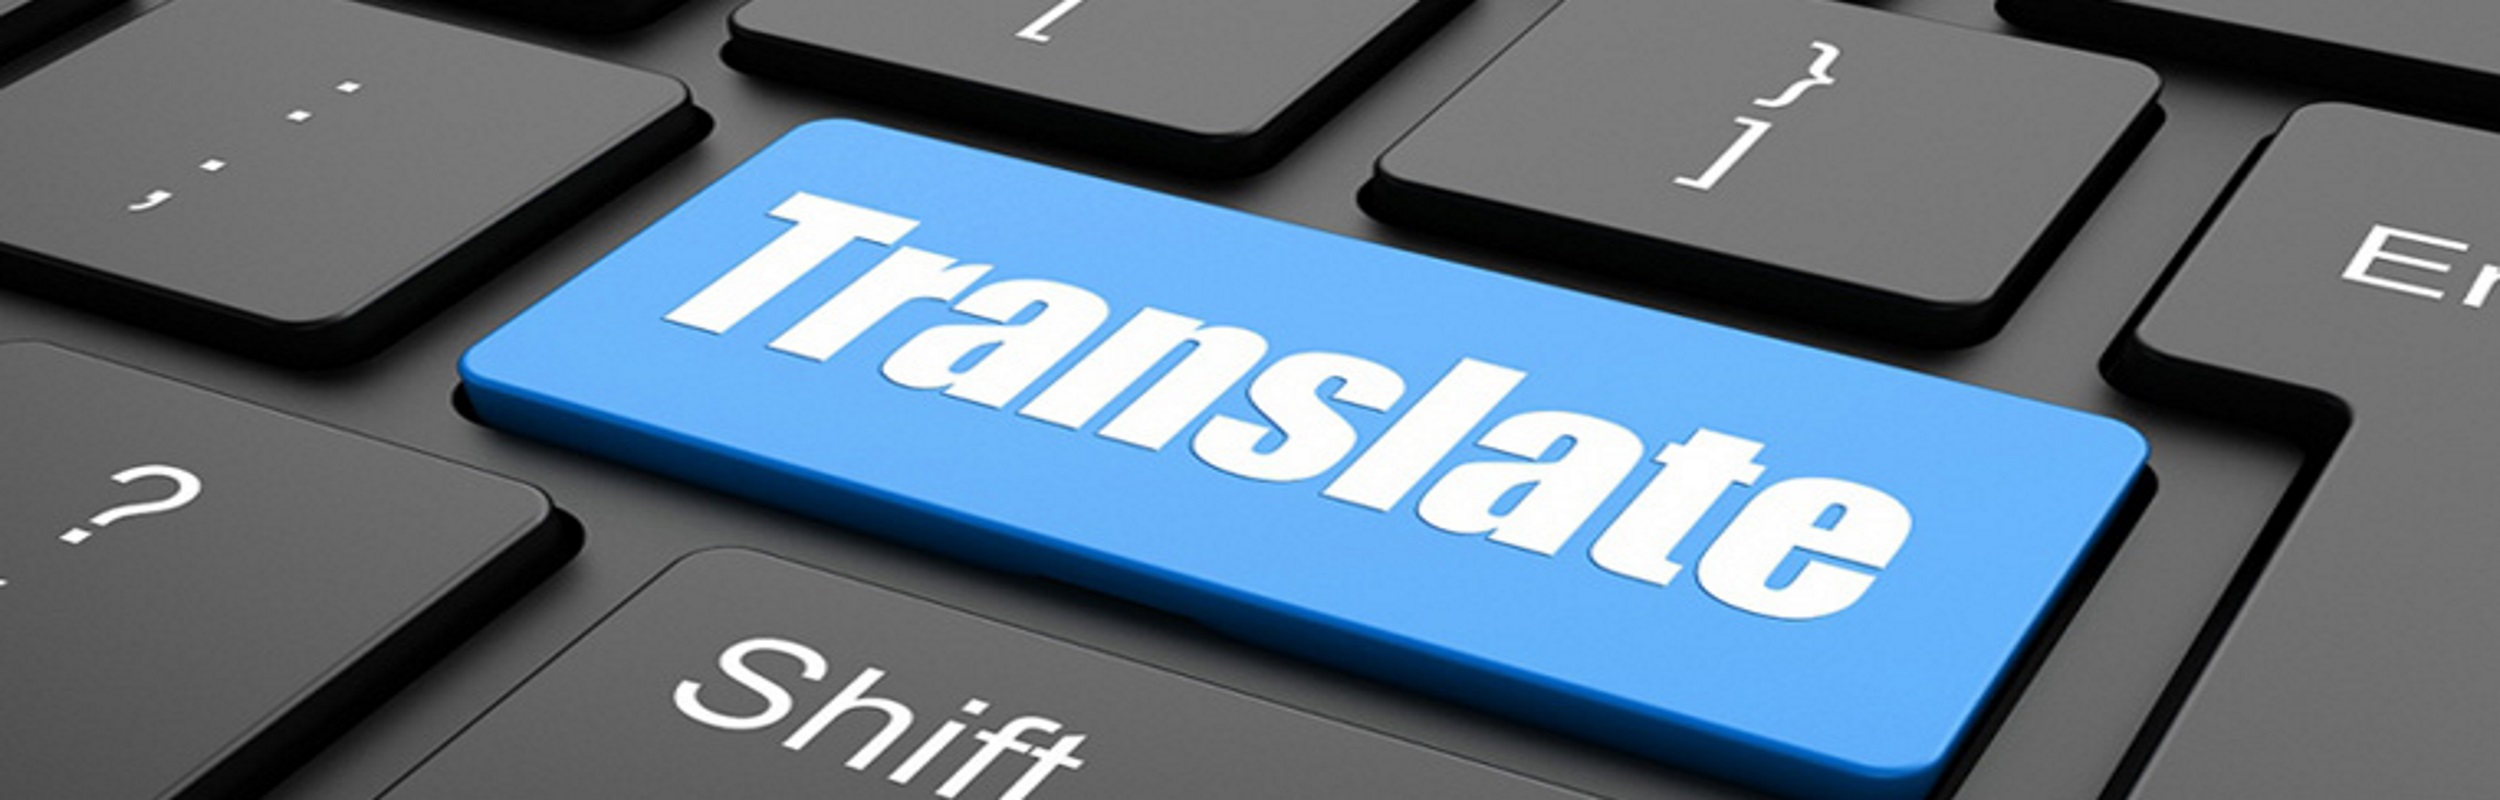 Çeviri redaksiyonu